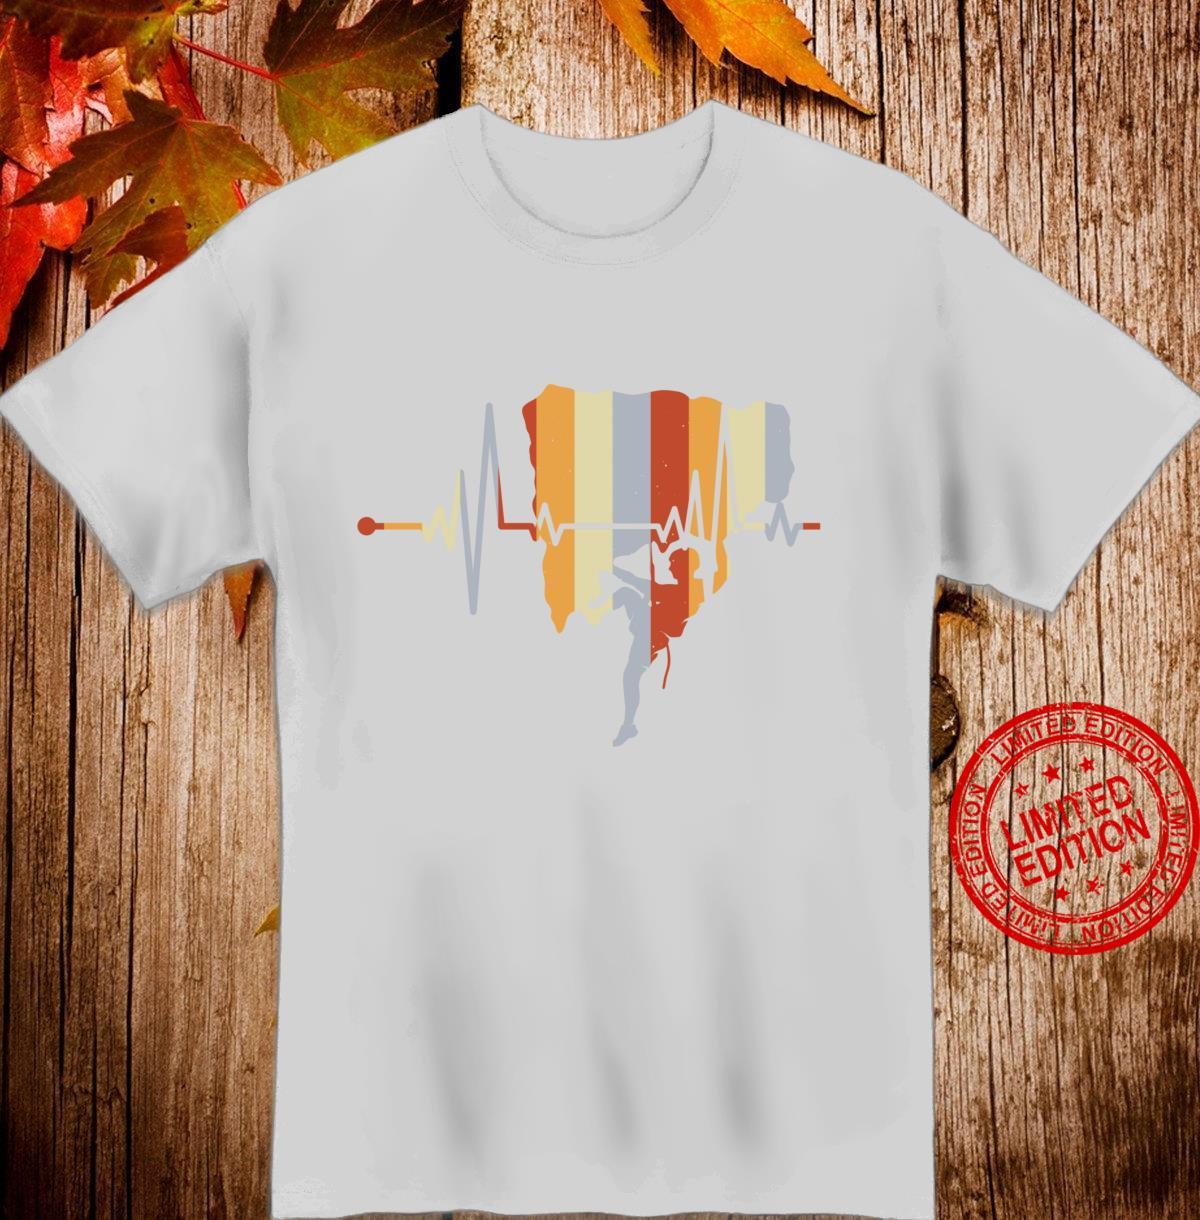 Vintage Retro Distressed Heartbeat Rock Climbing Cute Shirt